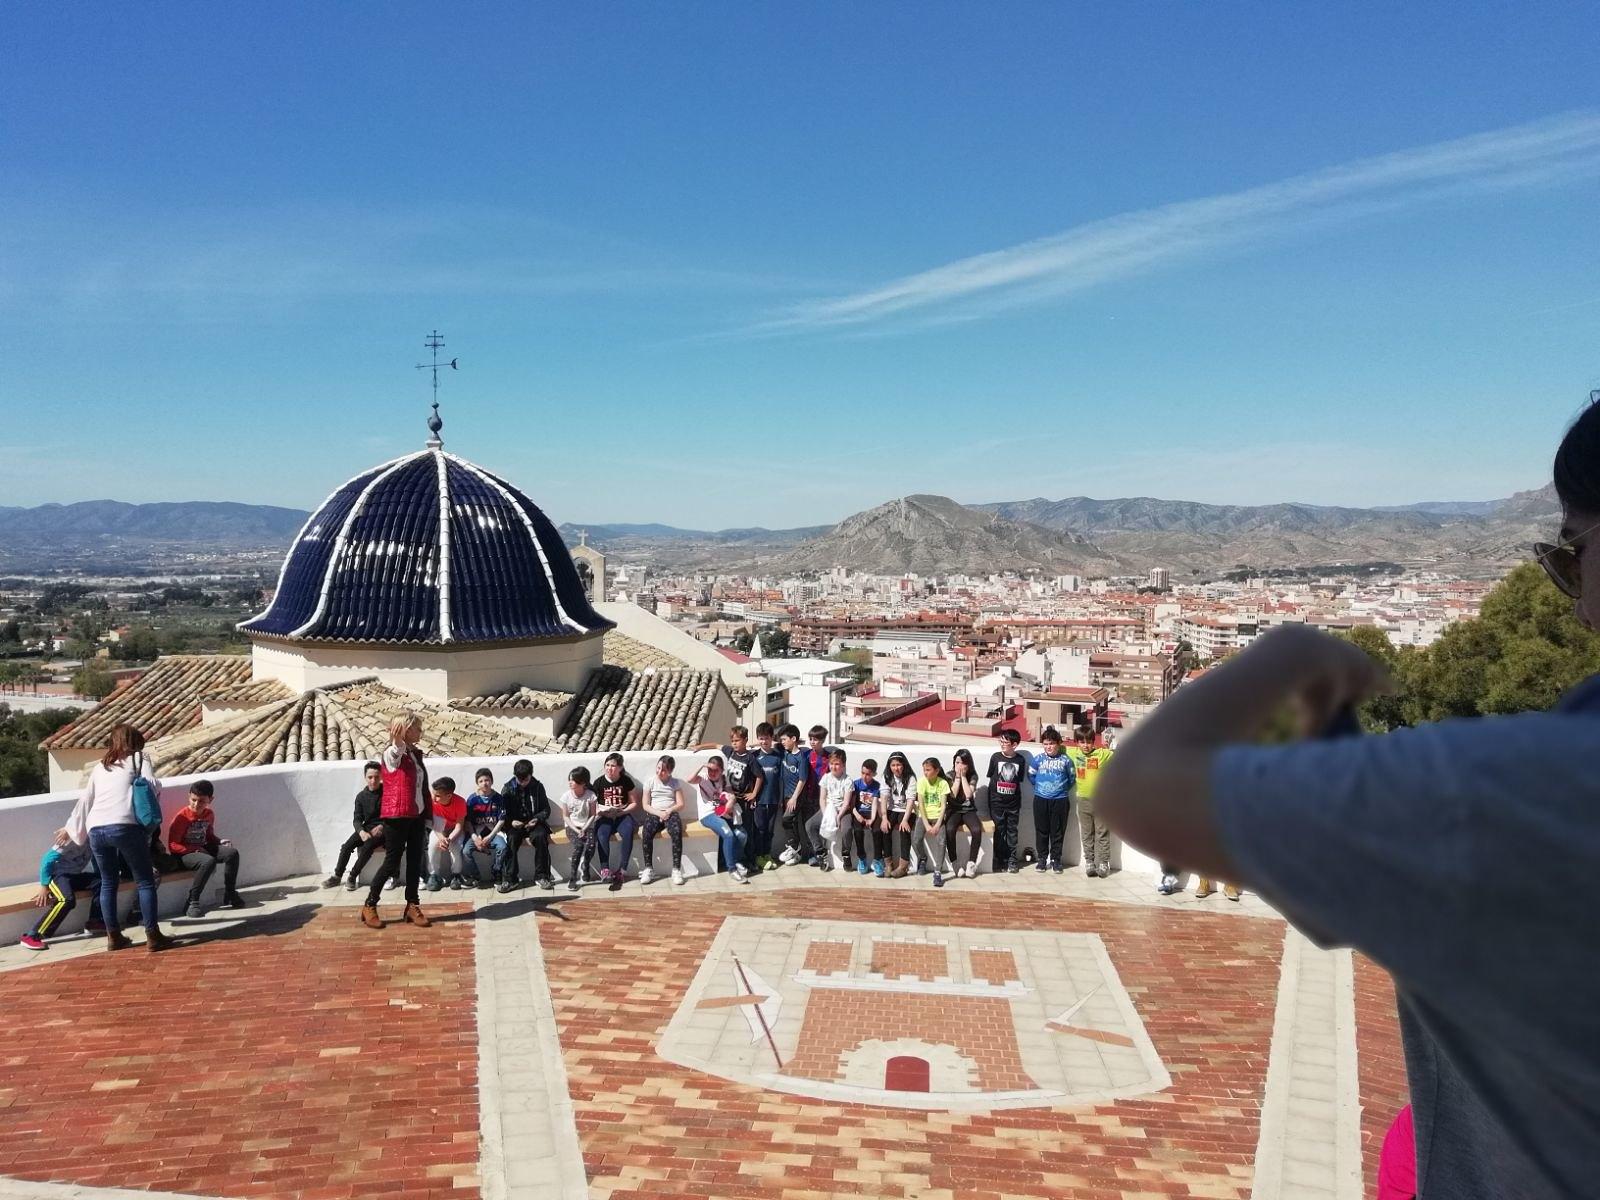 (2018-04-18) - Visita ermita alumnos Beatriz-Carmina-Lucía,3º,La Foia - María Isabel Berenguer Brotons - (09)